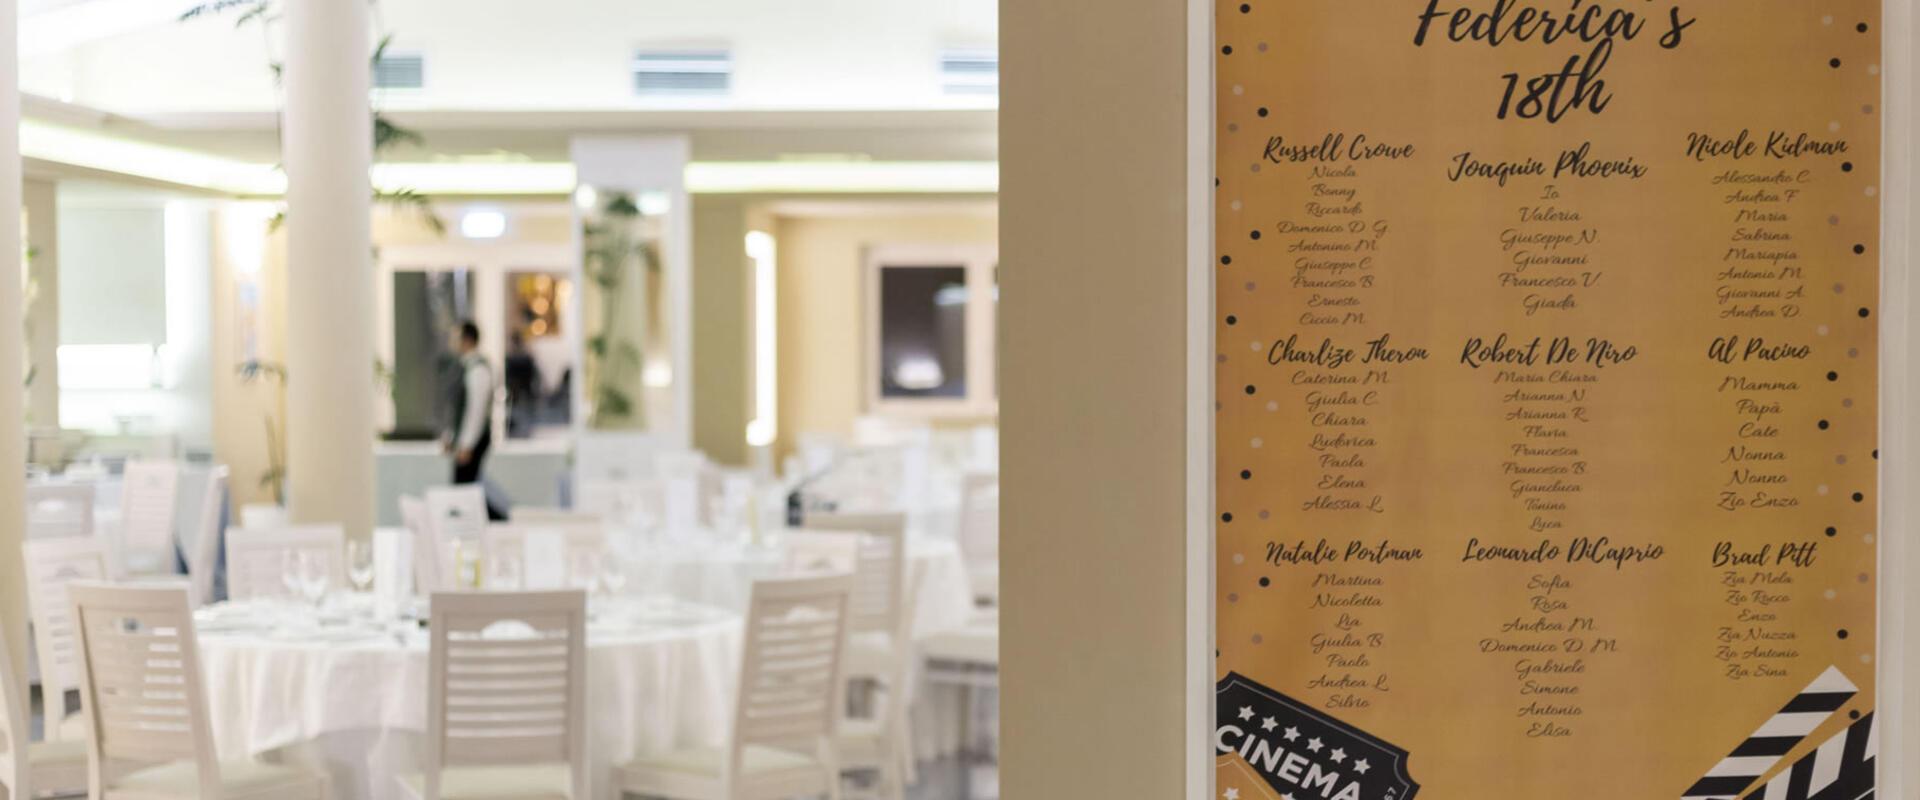 borgodonnacanfora it location-eventi-calabria 002